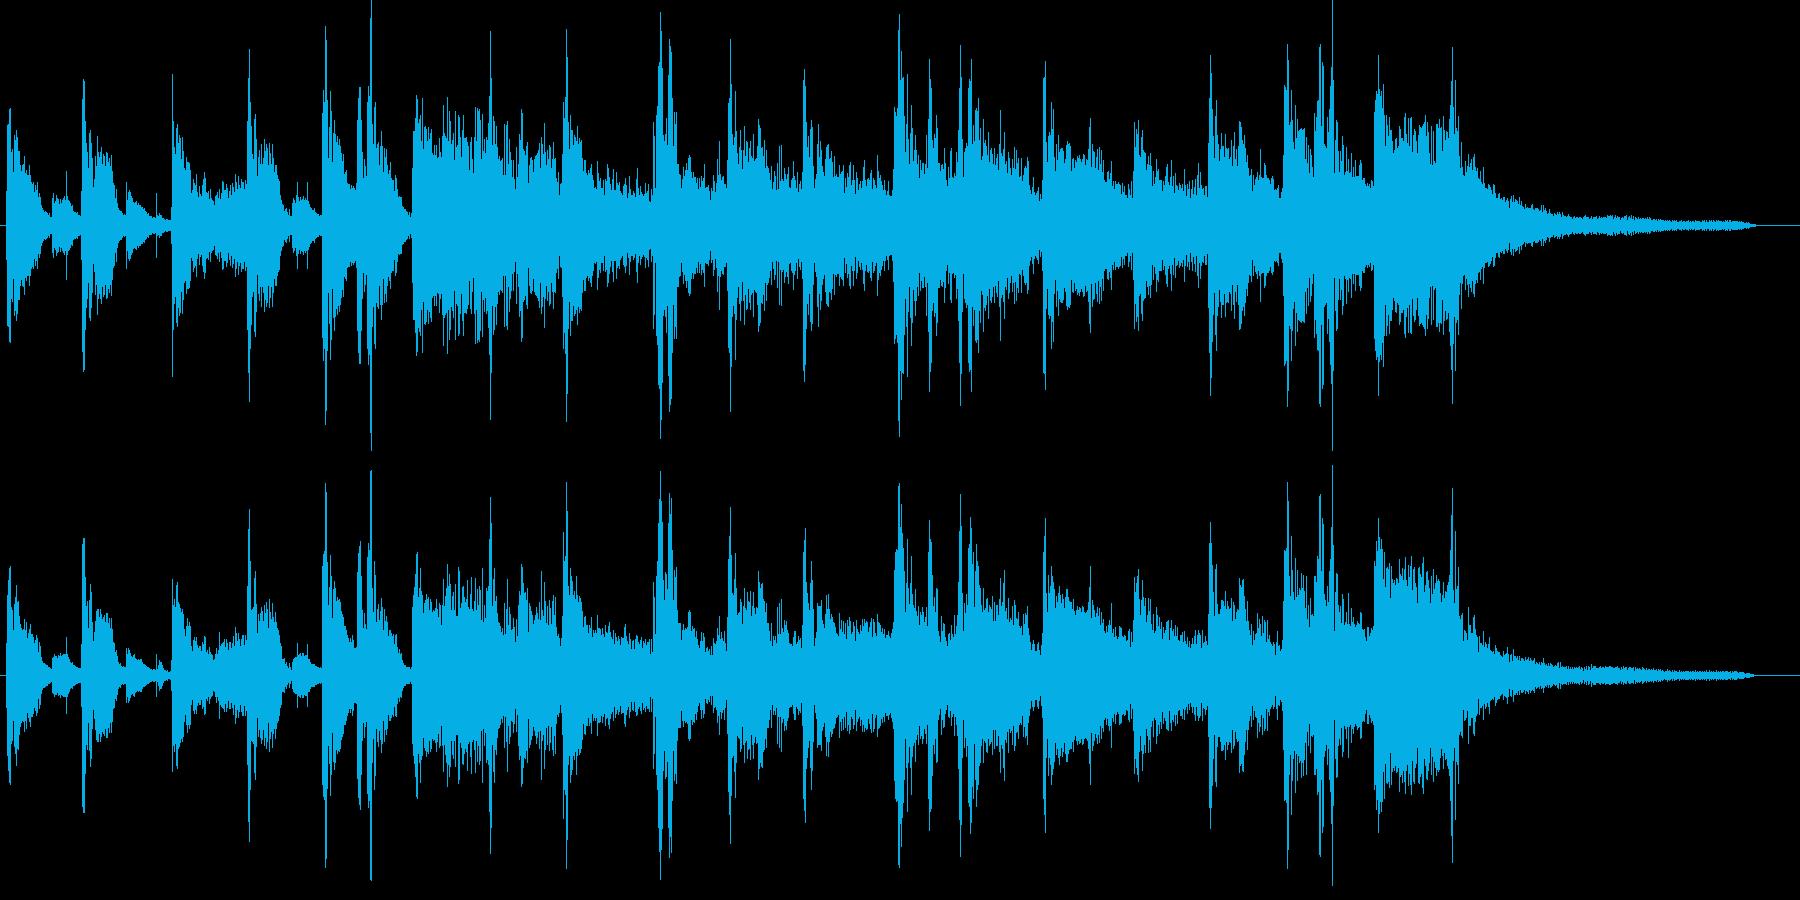 JAZZピアノサックスレトロ企業VPの再生済みの波形